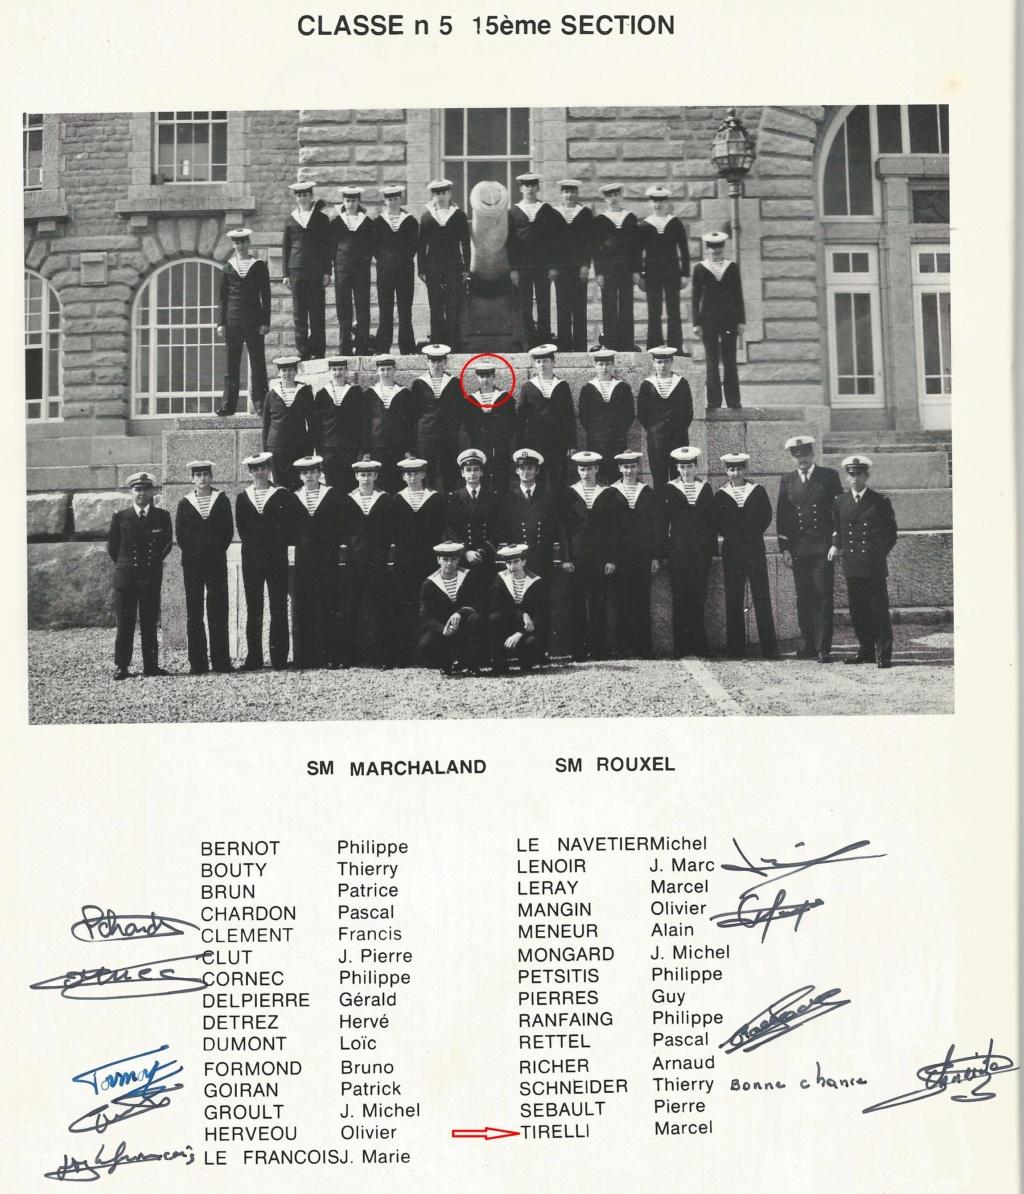 [ École des Mousses ] École des mousses 76/77 Mousse65